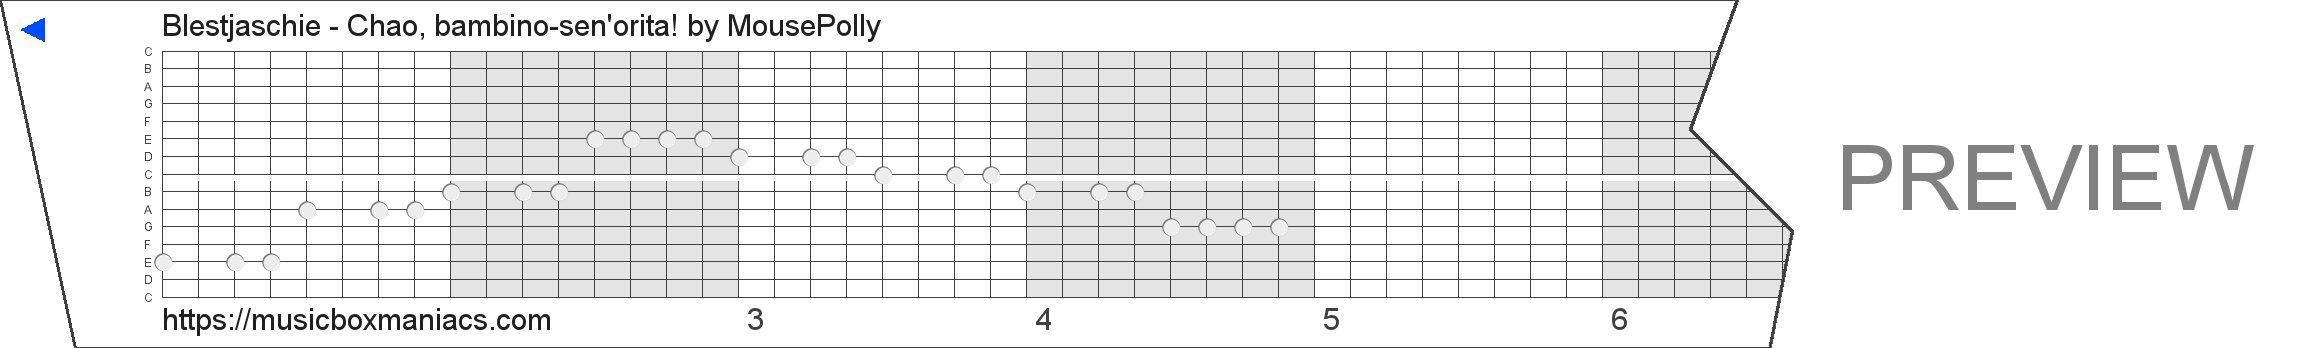 Blestjaschie - Chao, bambino-sen'orita! 15 note music box paper strip